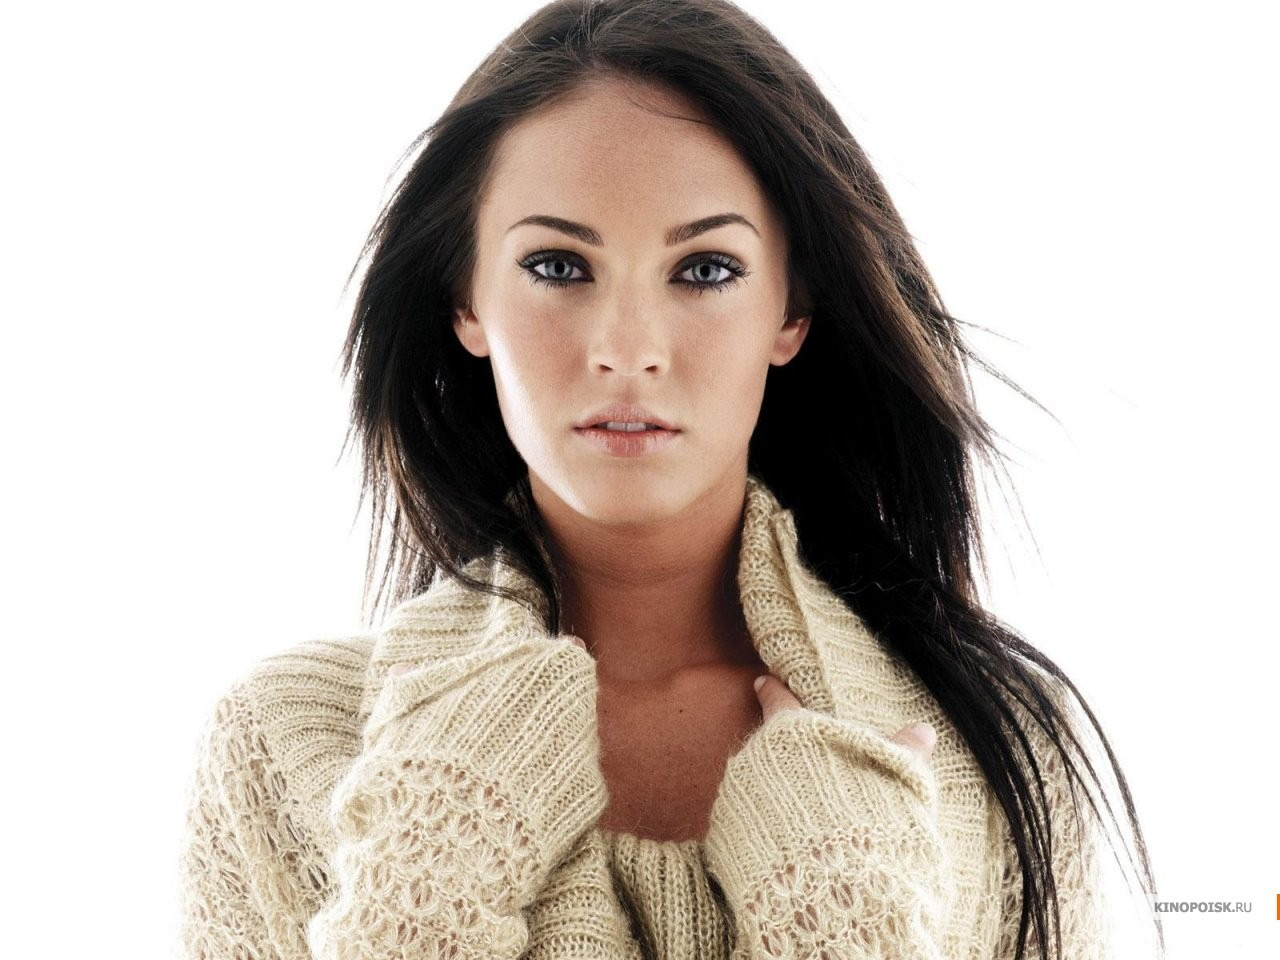 Megan Fox Wallpaper   Fashion, Beauty, and Hairstyles 2012 ...